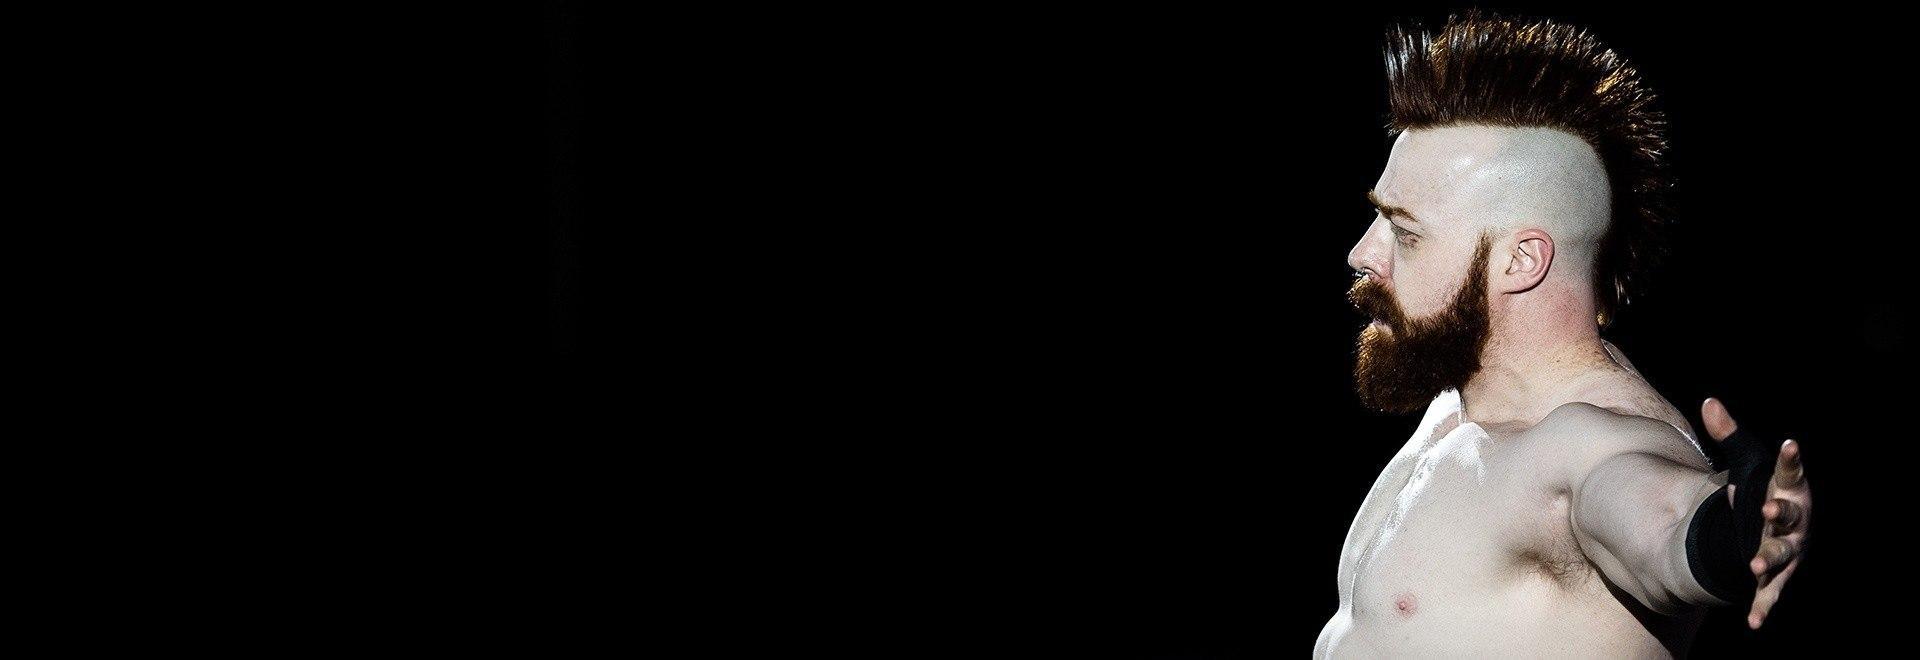 Ep. 243